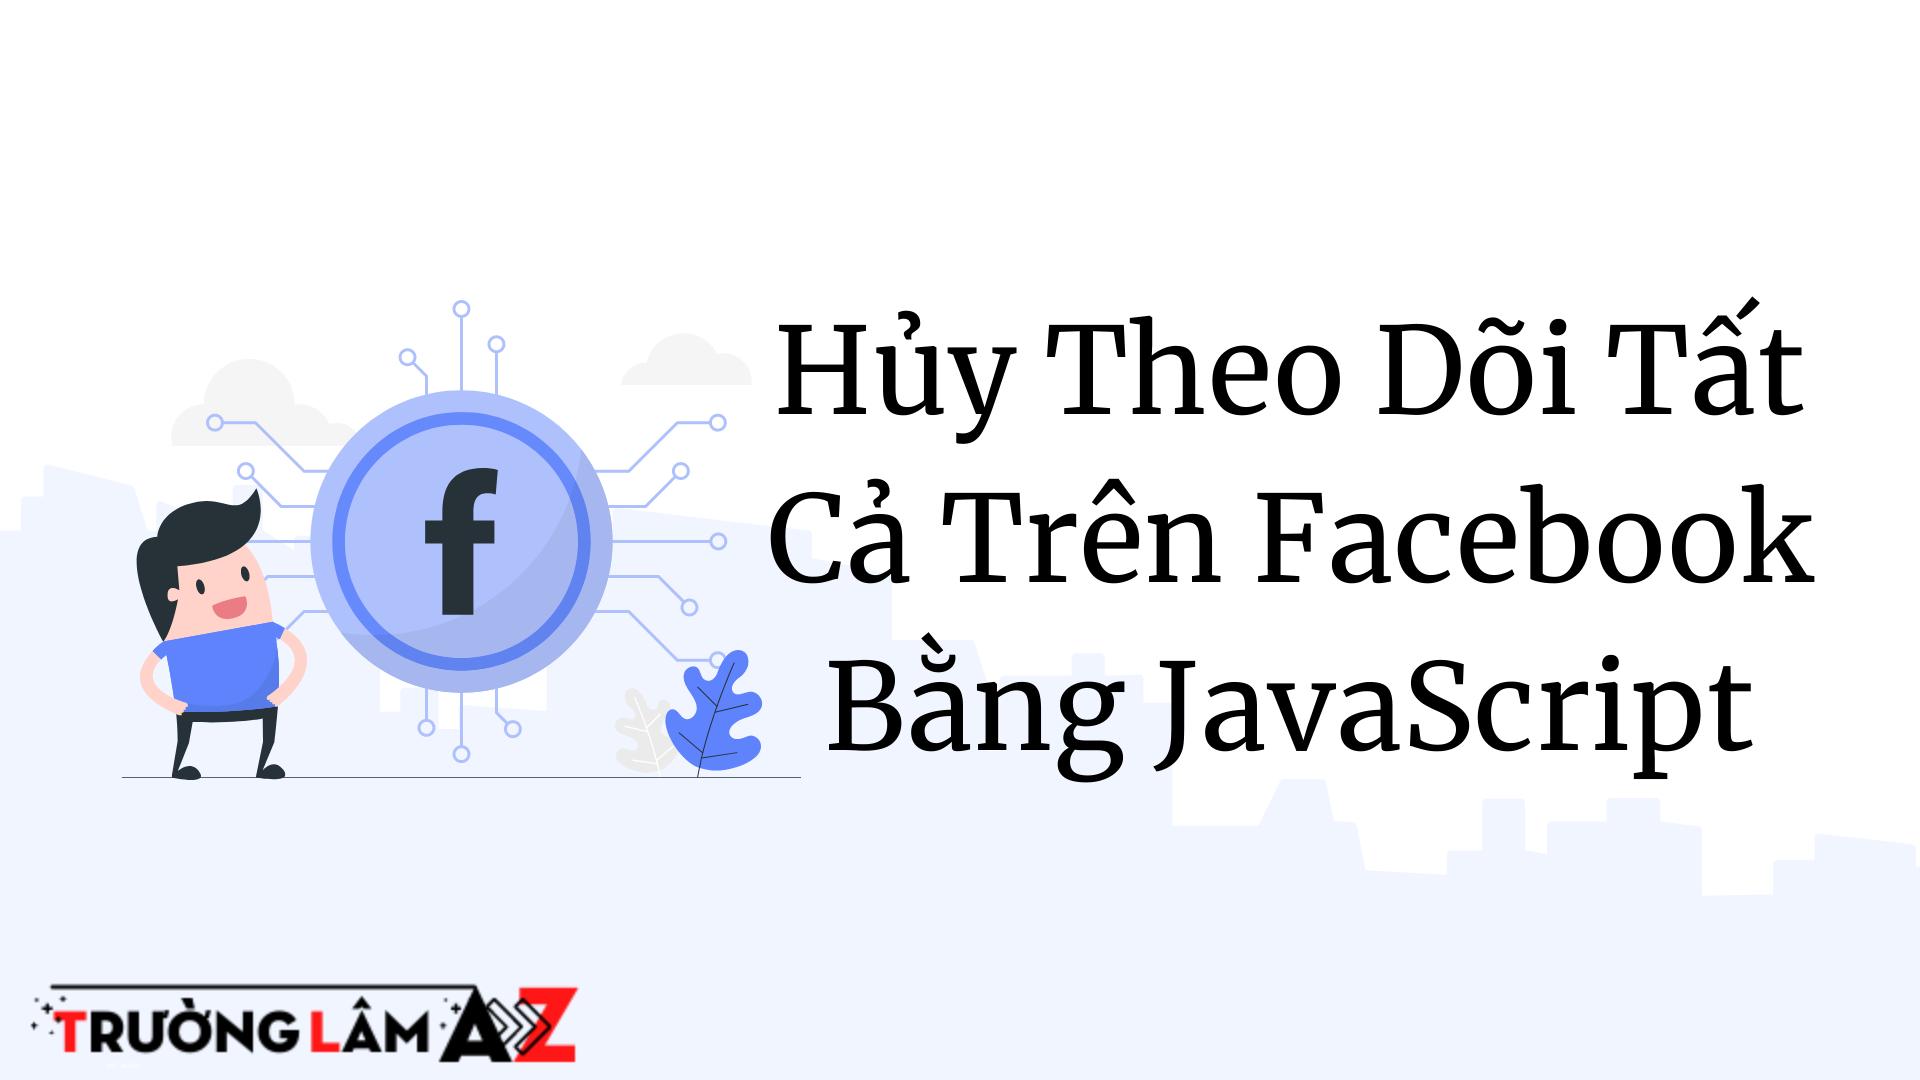 huy-theo-doi-tat-ca-tren-facebook